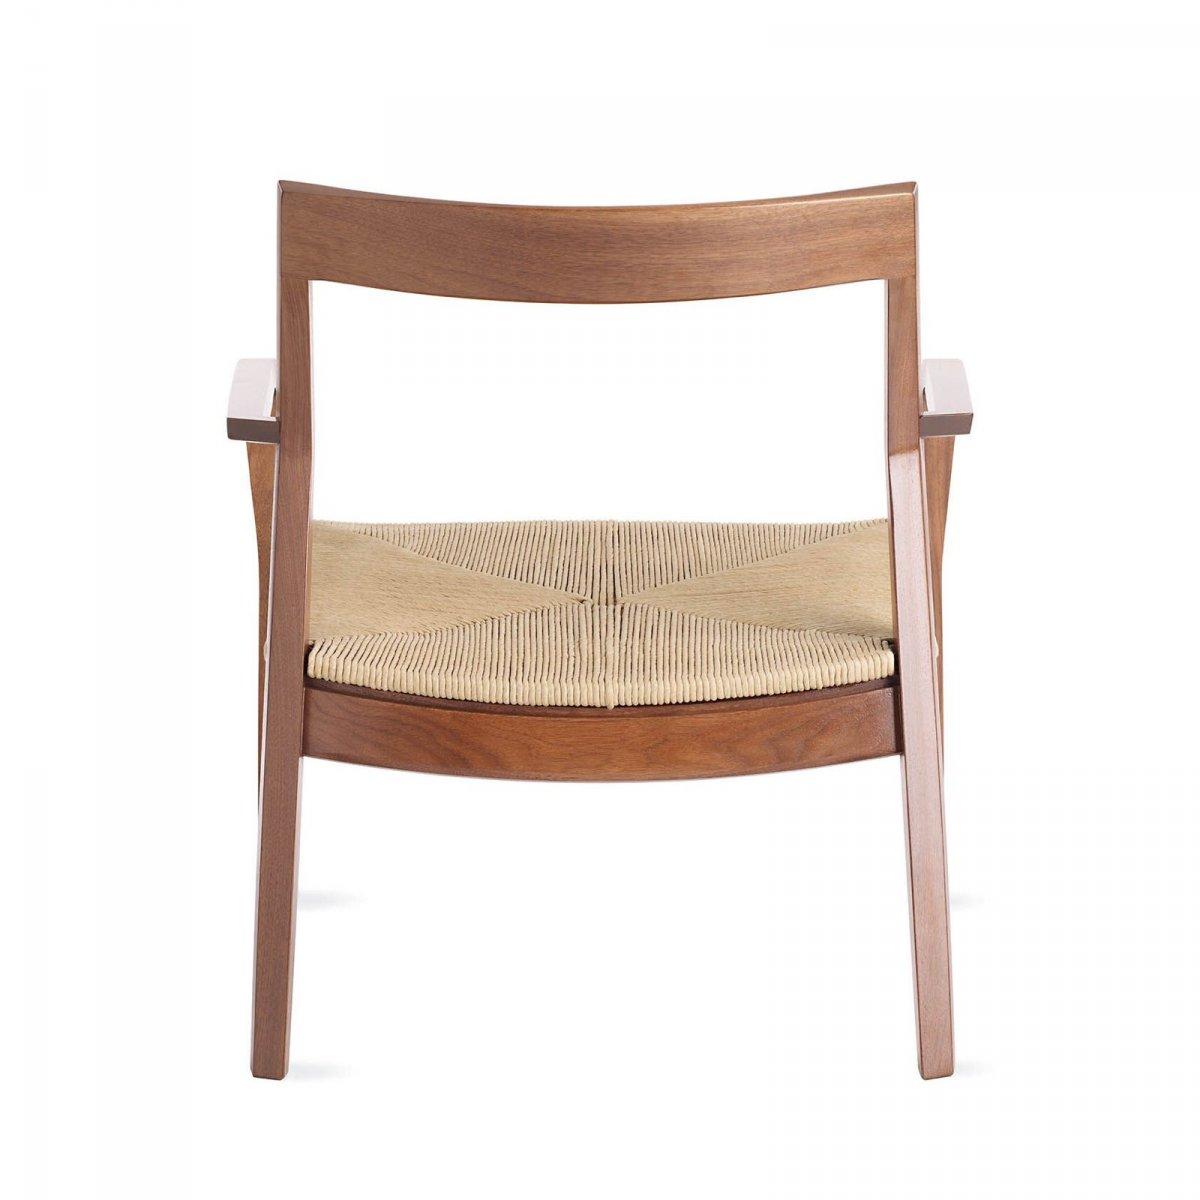 Krusin Lounge Arm Chair, walnut, back view.